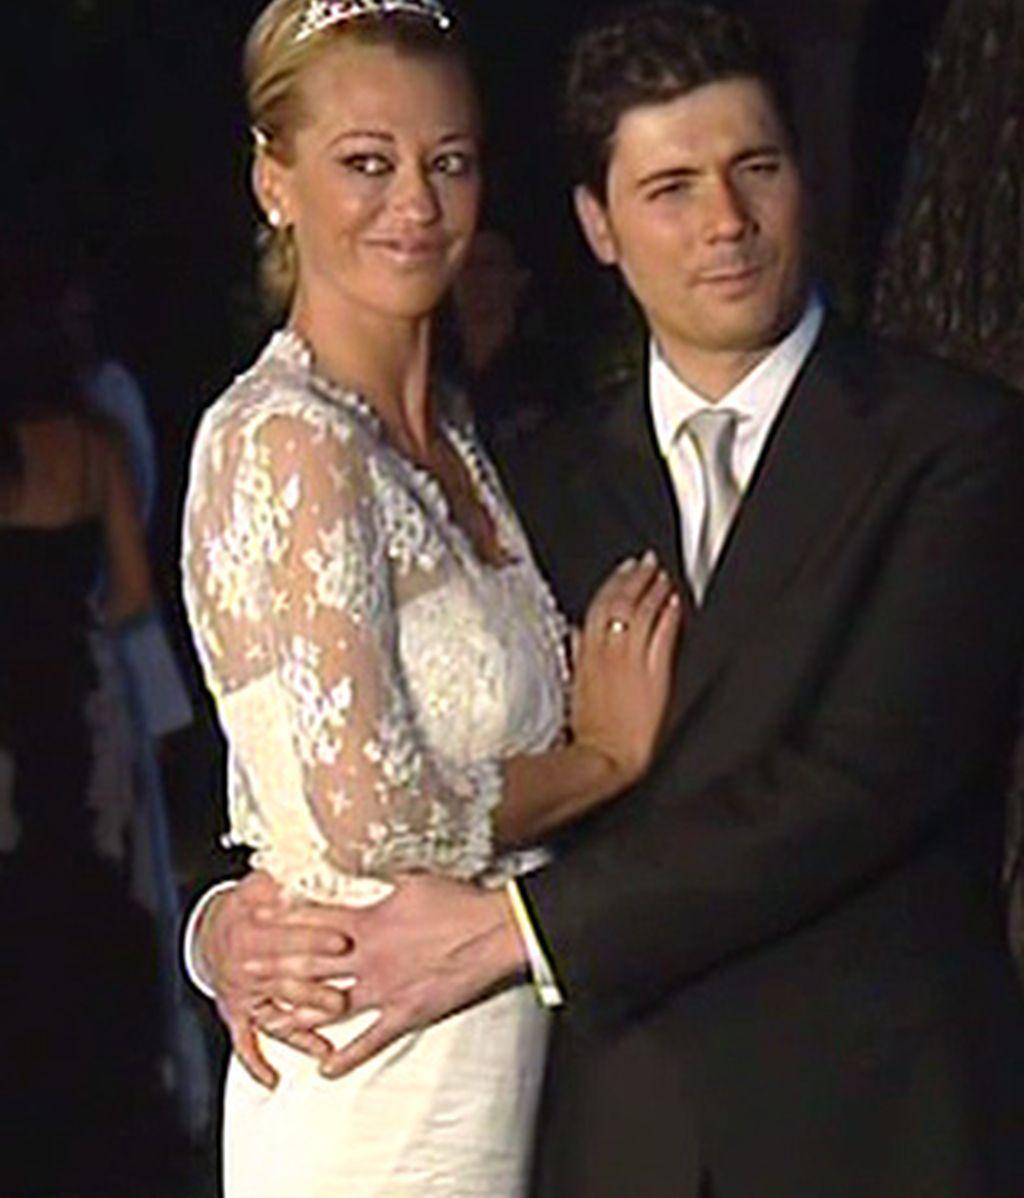 Una imagen de la feliz pareja